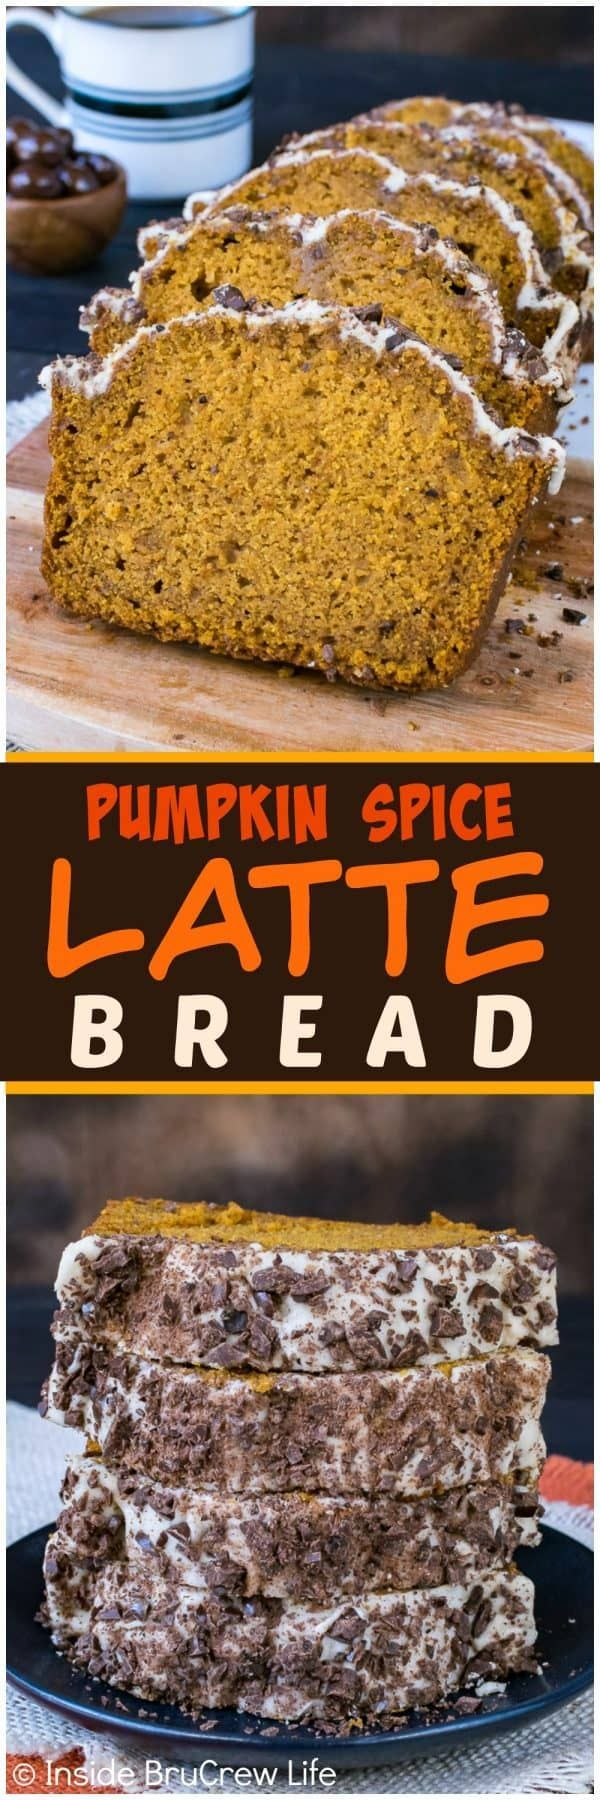 Pumpkin Spice Latte Bread - this sweet pumpkin bread has a coffee glaze & chocolate covered coffee beans. Great recipe for fall breakfast! #pumpkin #bread #pumpkinbread